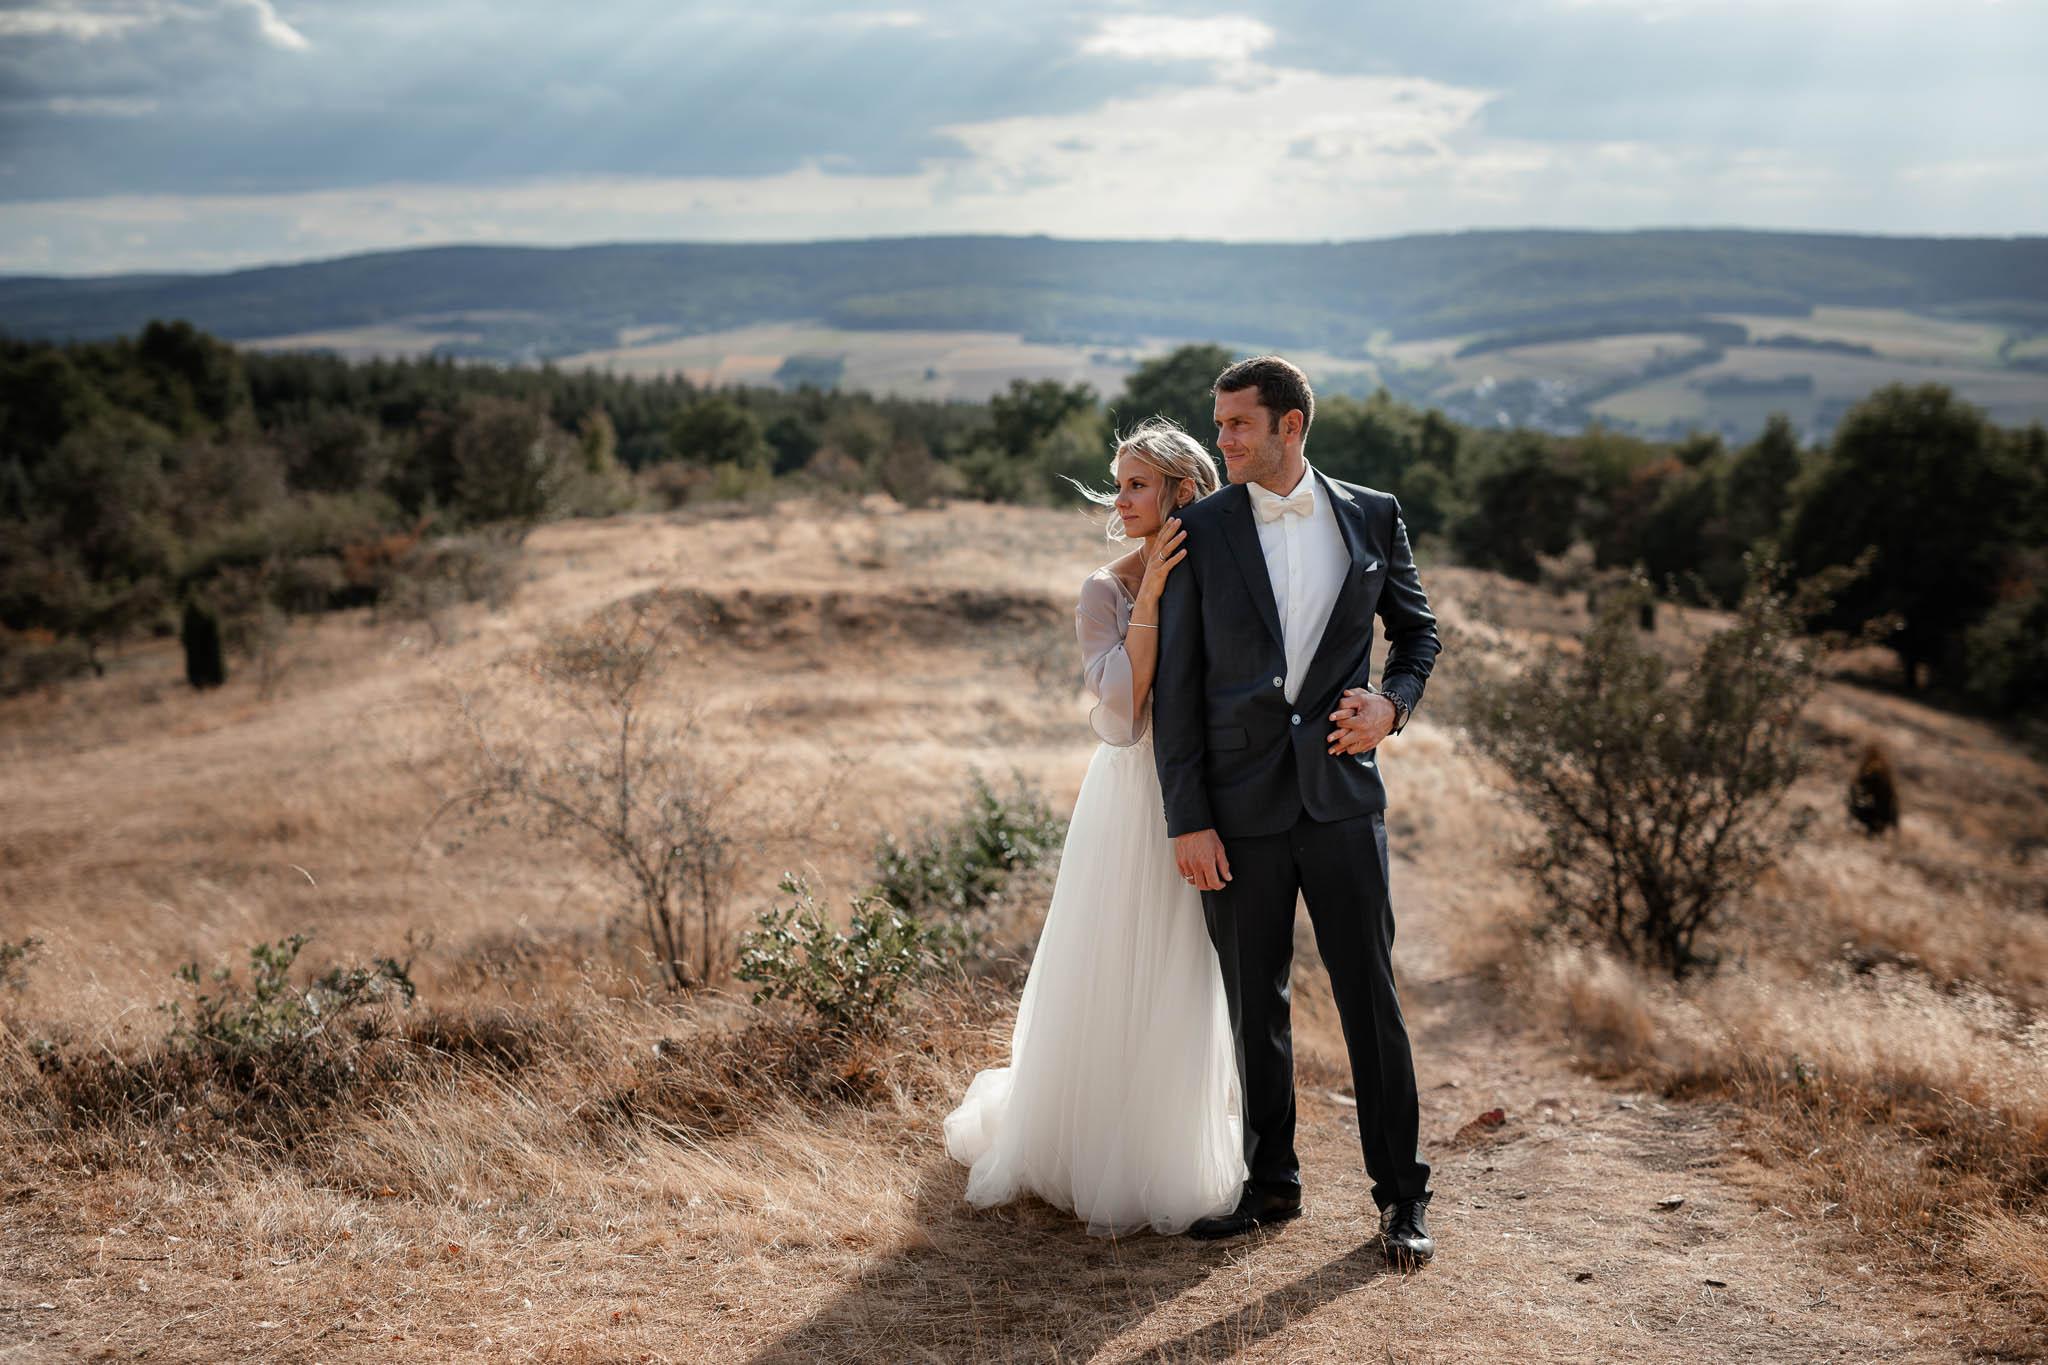 Hochzeitsfotograf Limburg an der Lahn